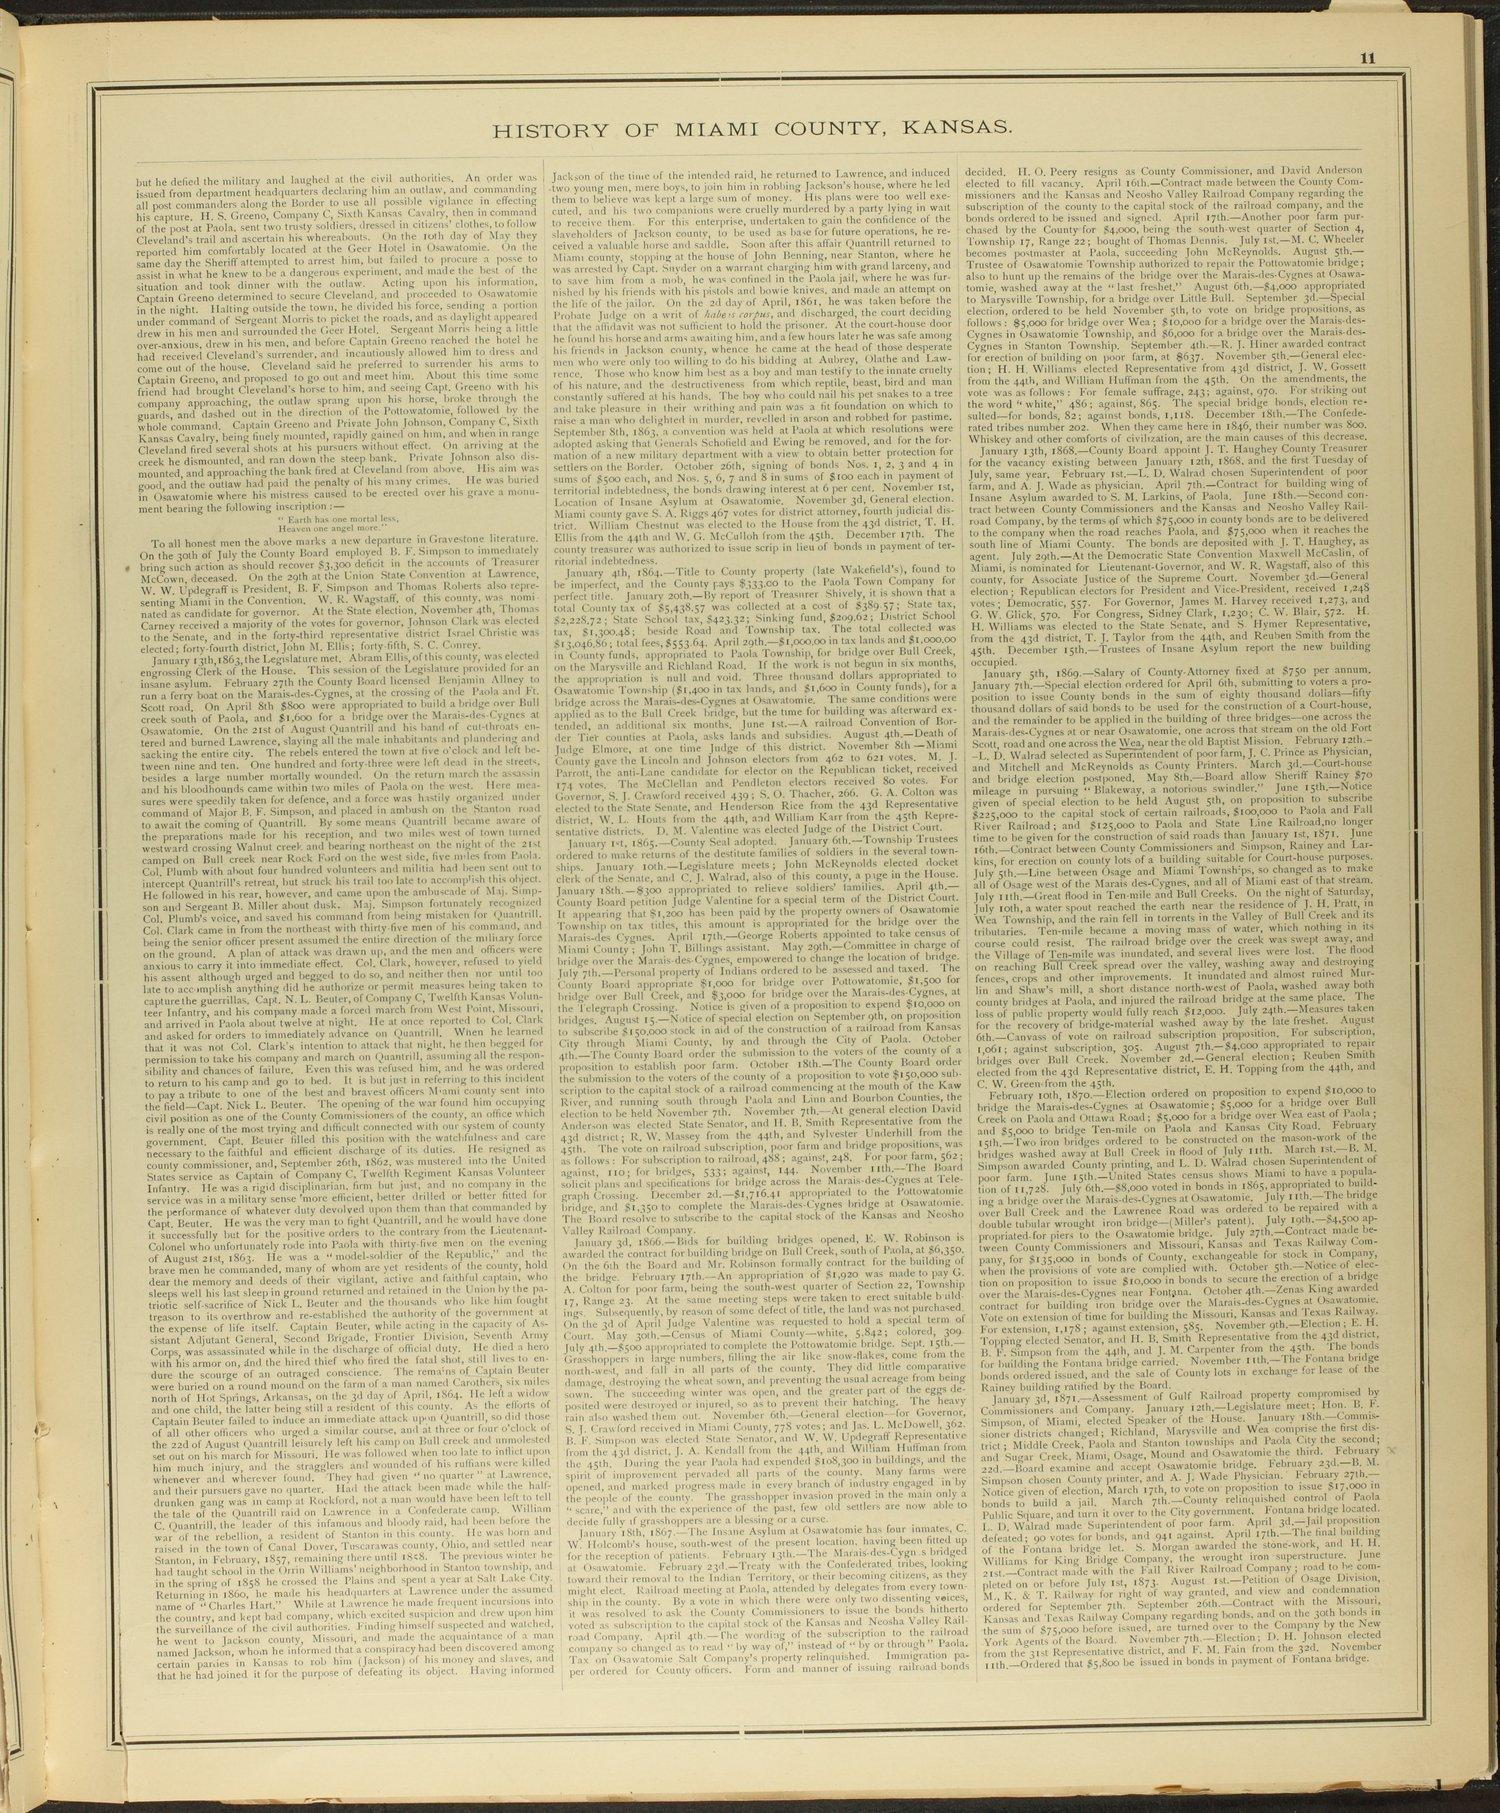 An illustrated historical atlas of Miami County, Kansas - 11